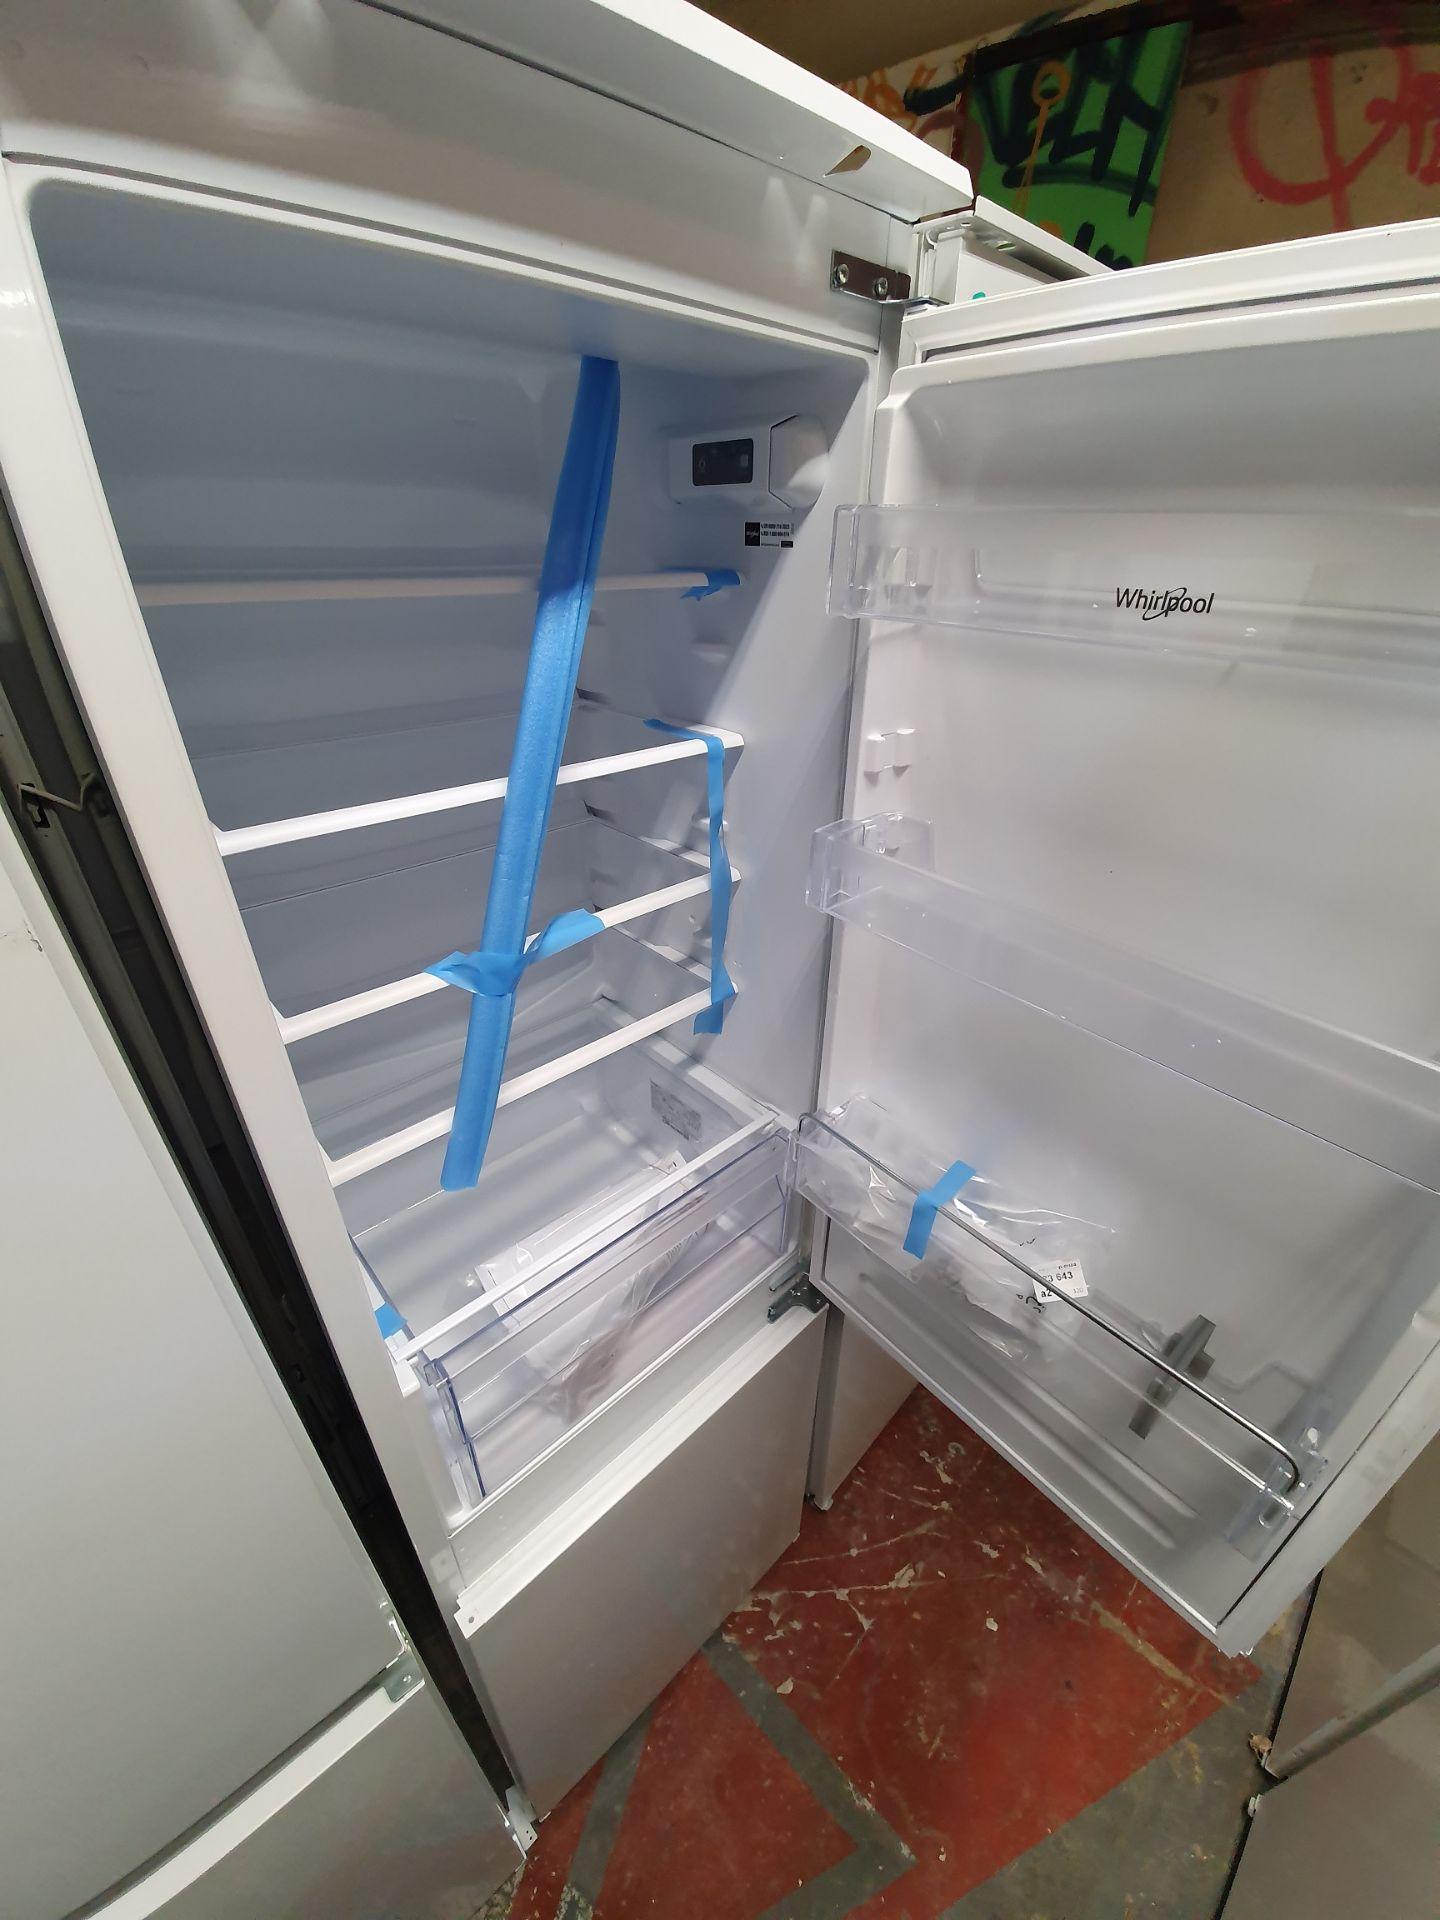 NEW/GRADED AND UNPACKAGED Prima PRRF702 Integrated Fridge Freezer (Brand new slight external - Image 10 of 14